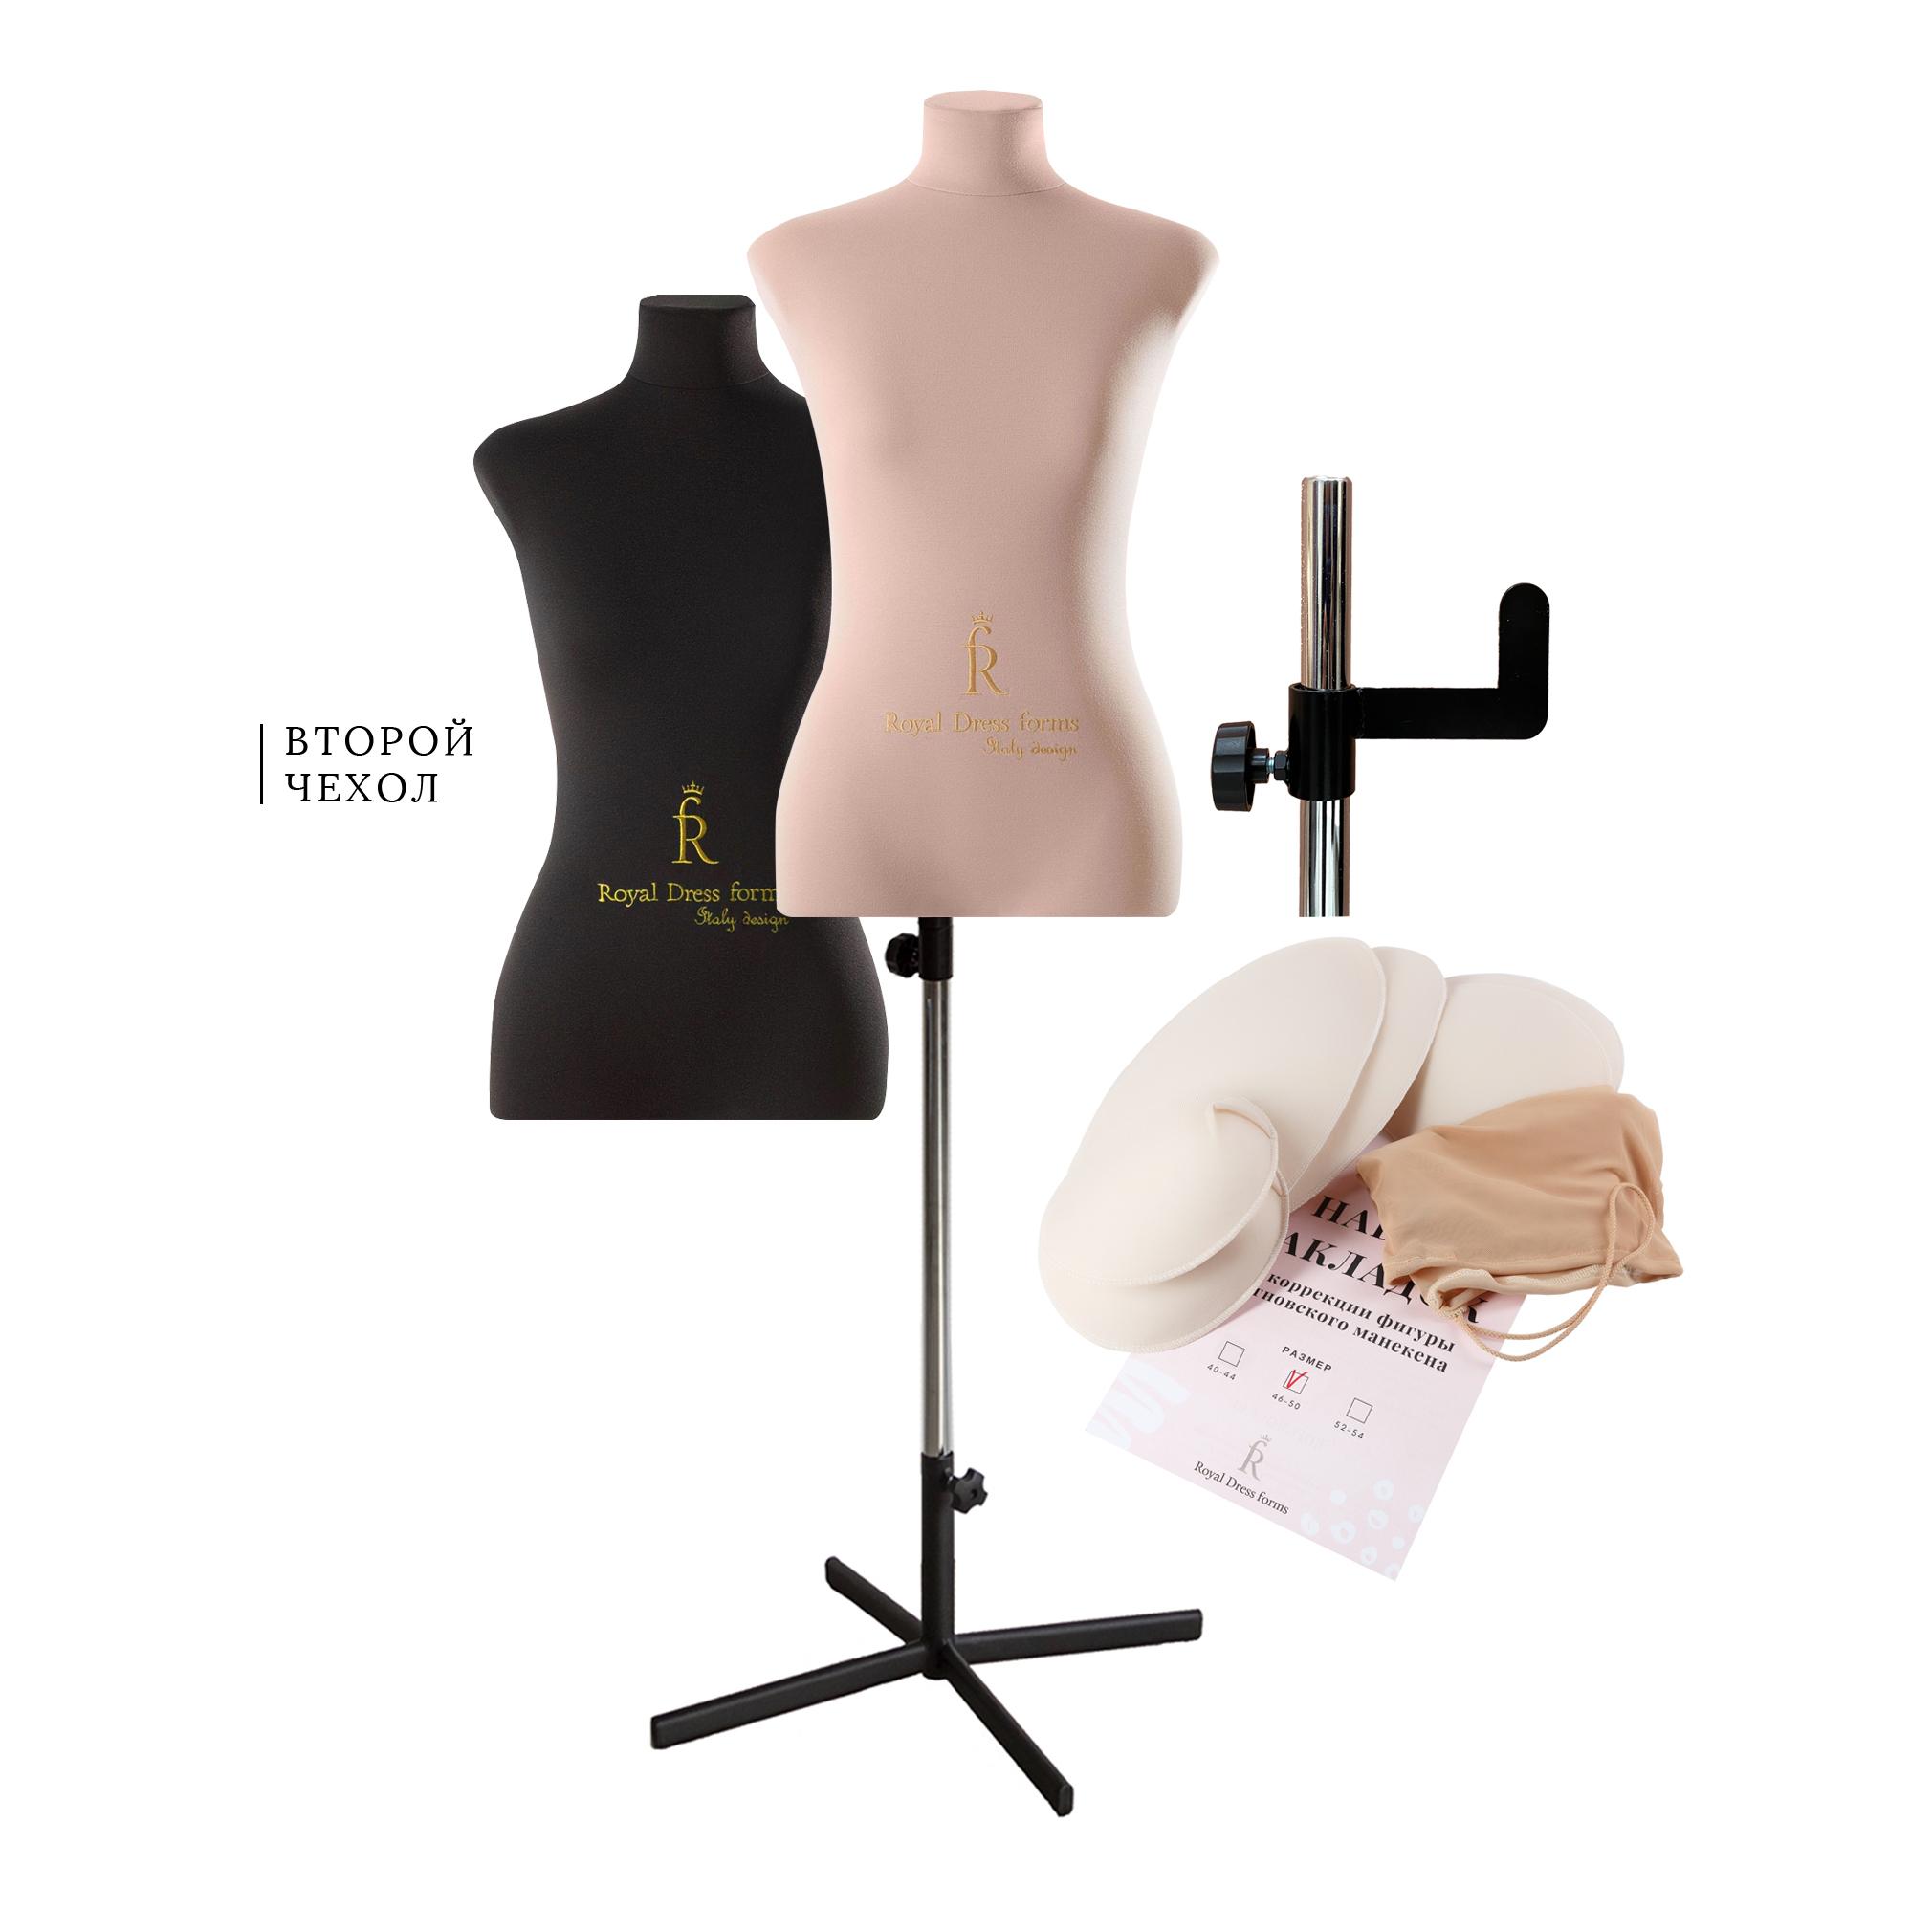 Манекен портновский Кристина, комплект Про, размер 46, цвет бежевый, в комплекте набор накладок и подставка